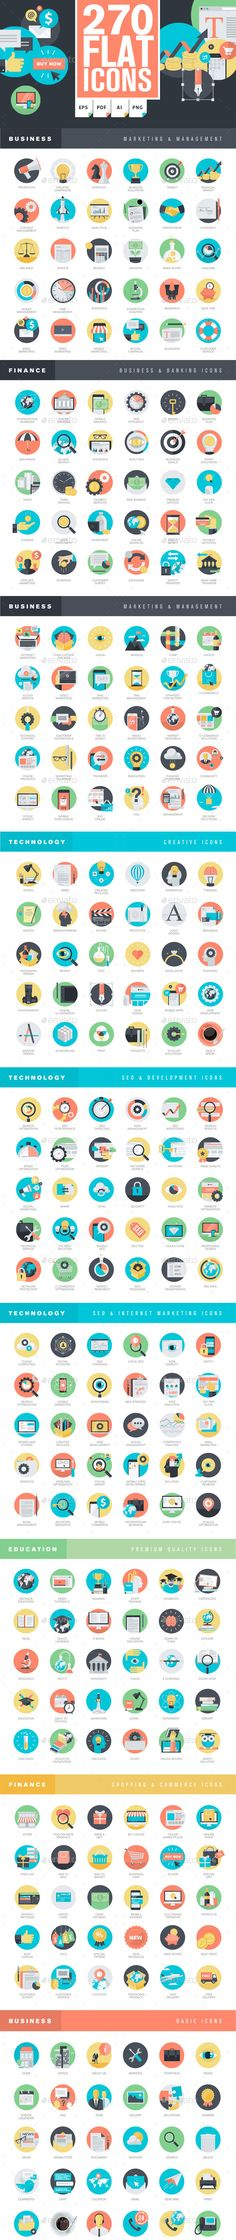 Set of 270 flat design icons for marketing, business, finance, e-commerce, web design & development, app development, SEO, online shopping, digital marketing, management, education. Download: http://graphicriver.net/item/set-of-flat-design-icons/11203539?ref=ksioks